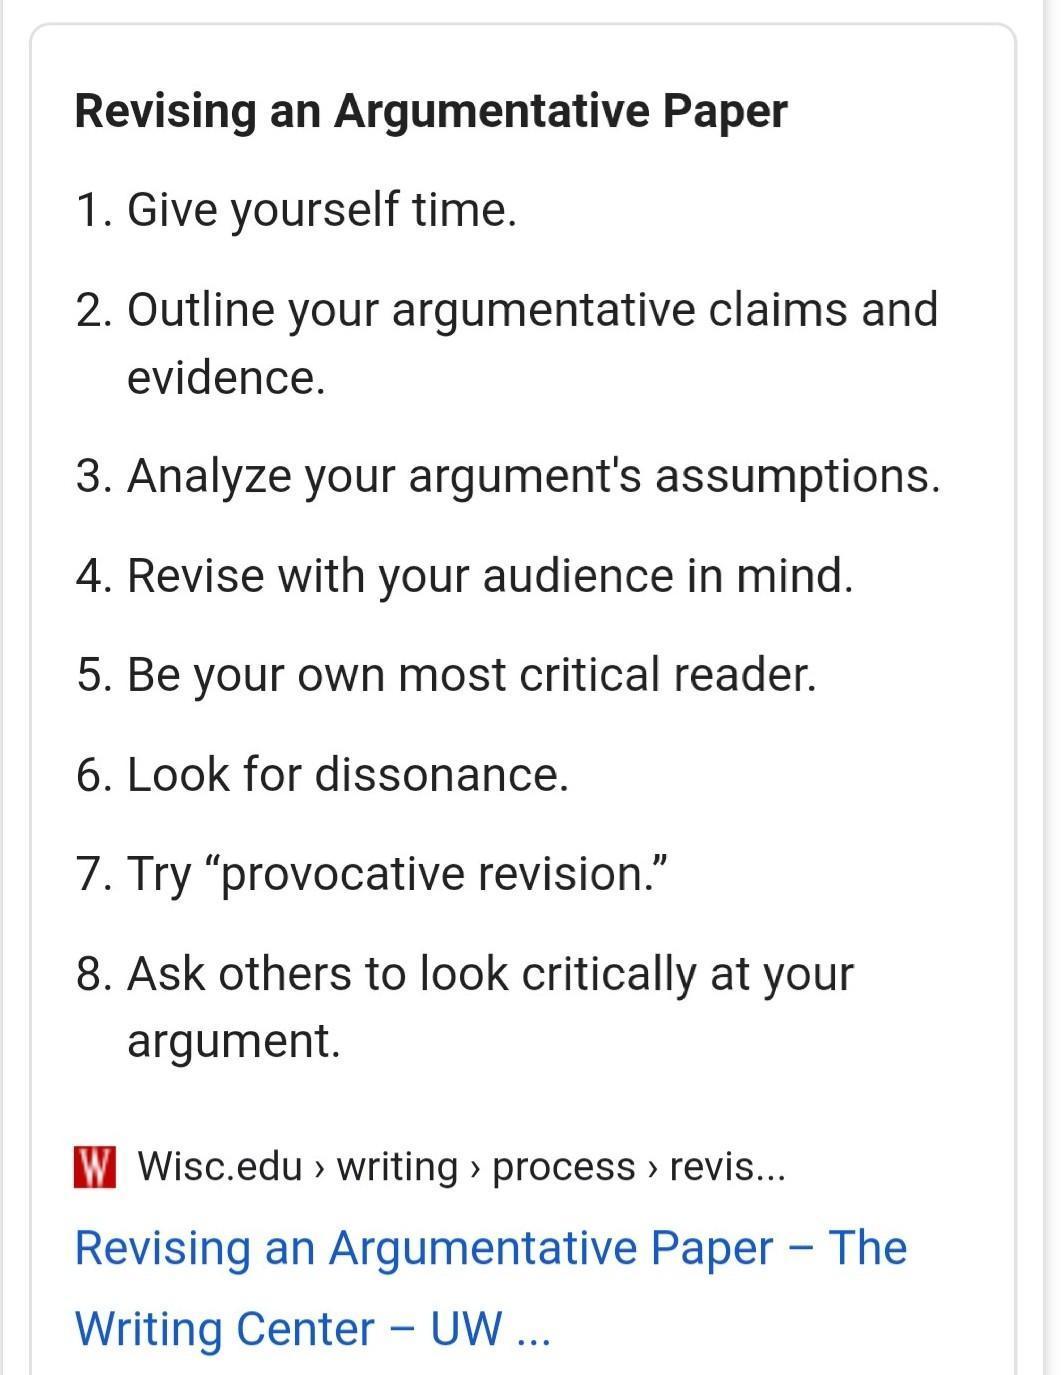 Essay checklist psyc uq